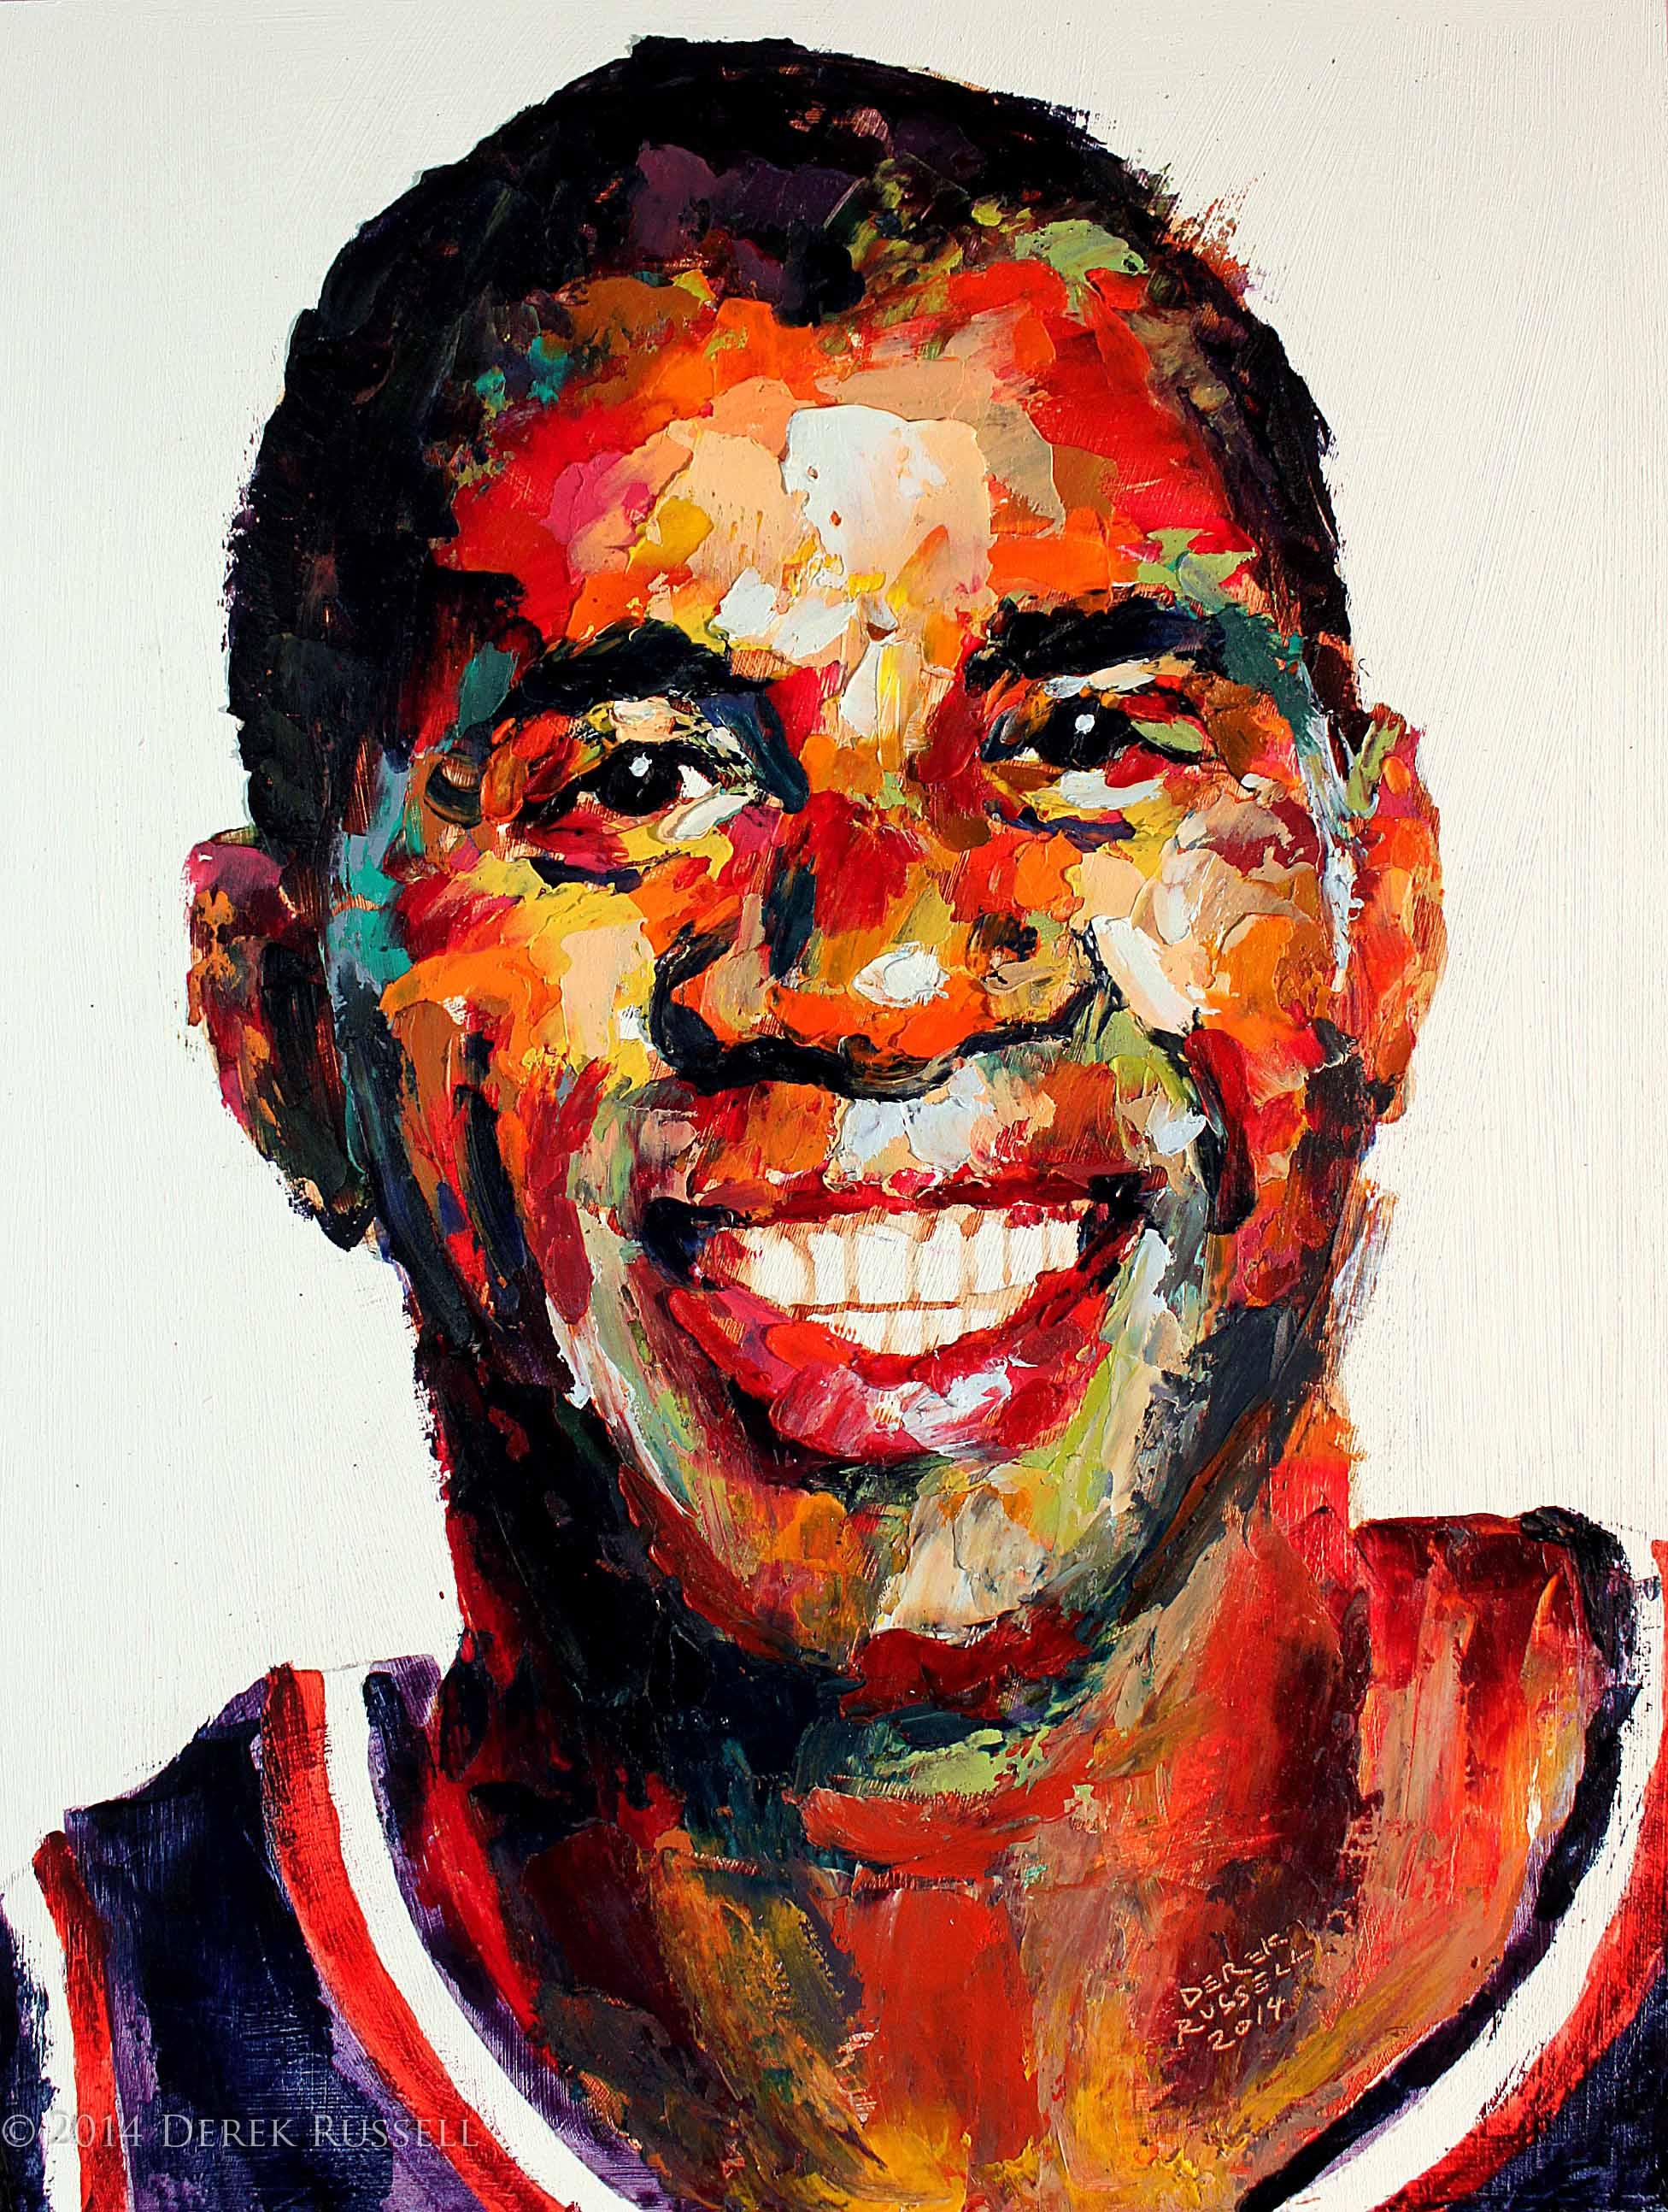 Magic Johnson Original Portrait Pop Art Painting by Derek Russell